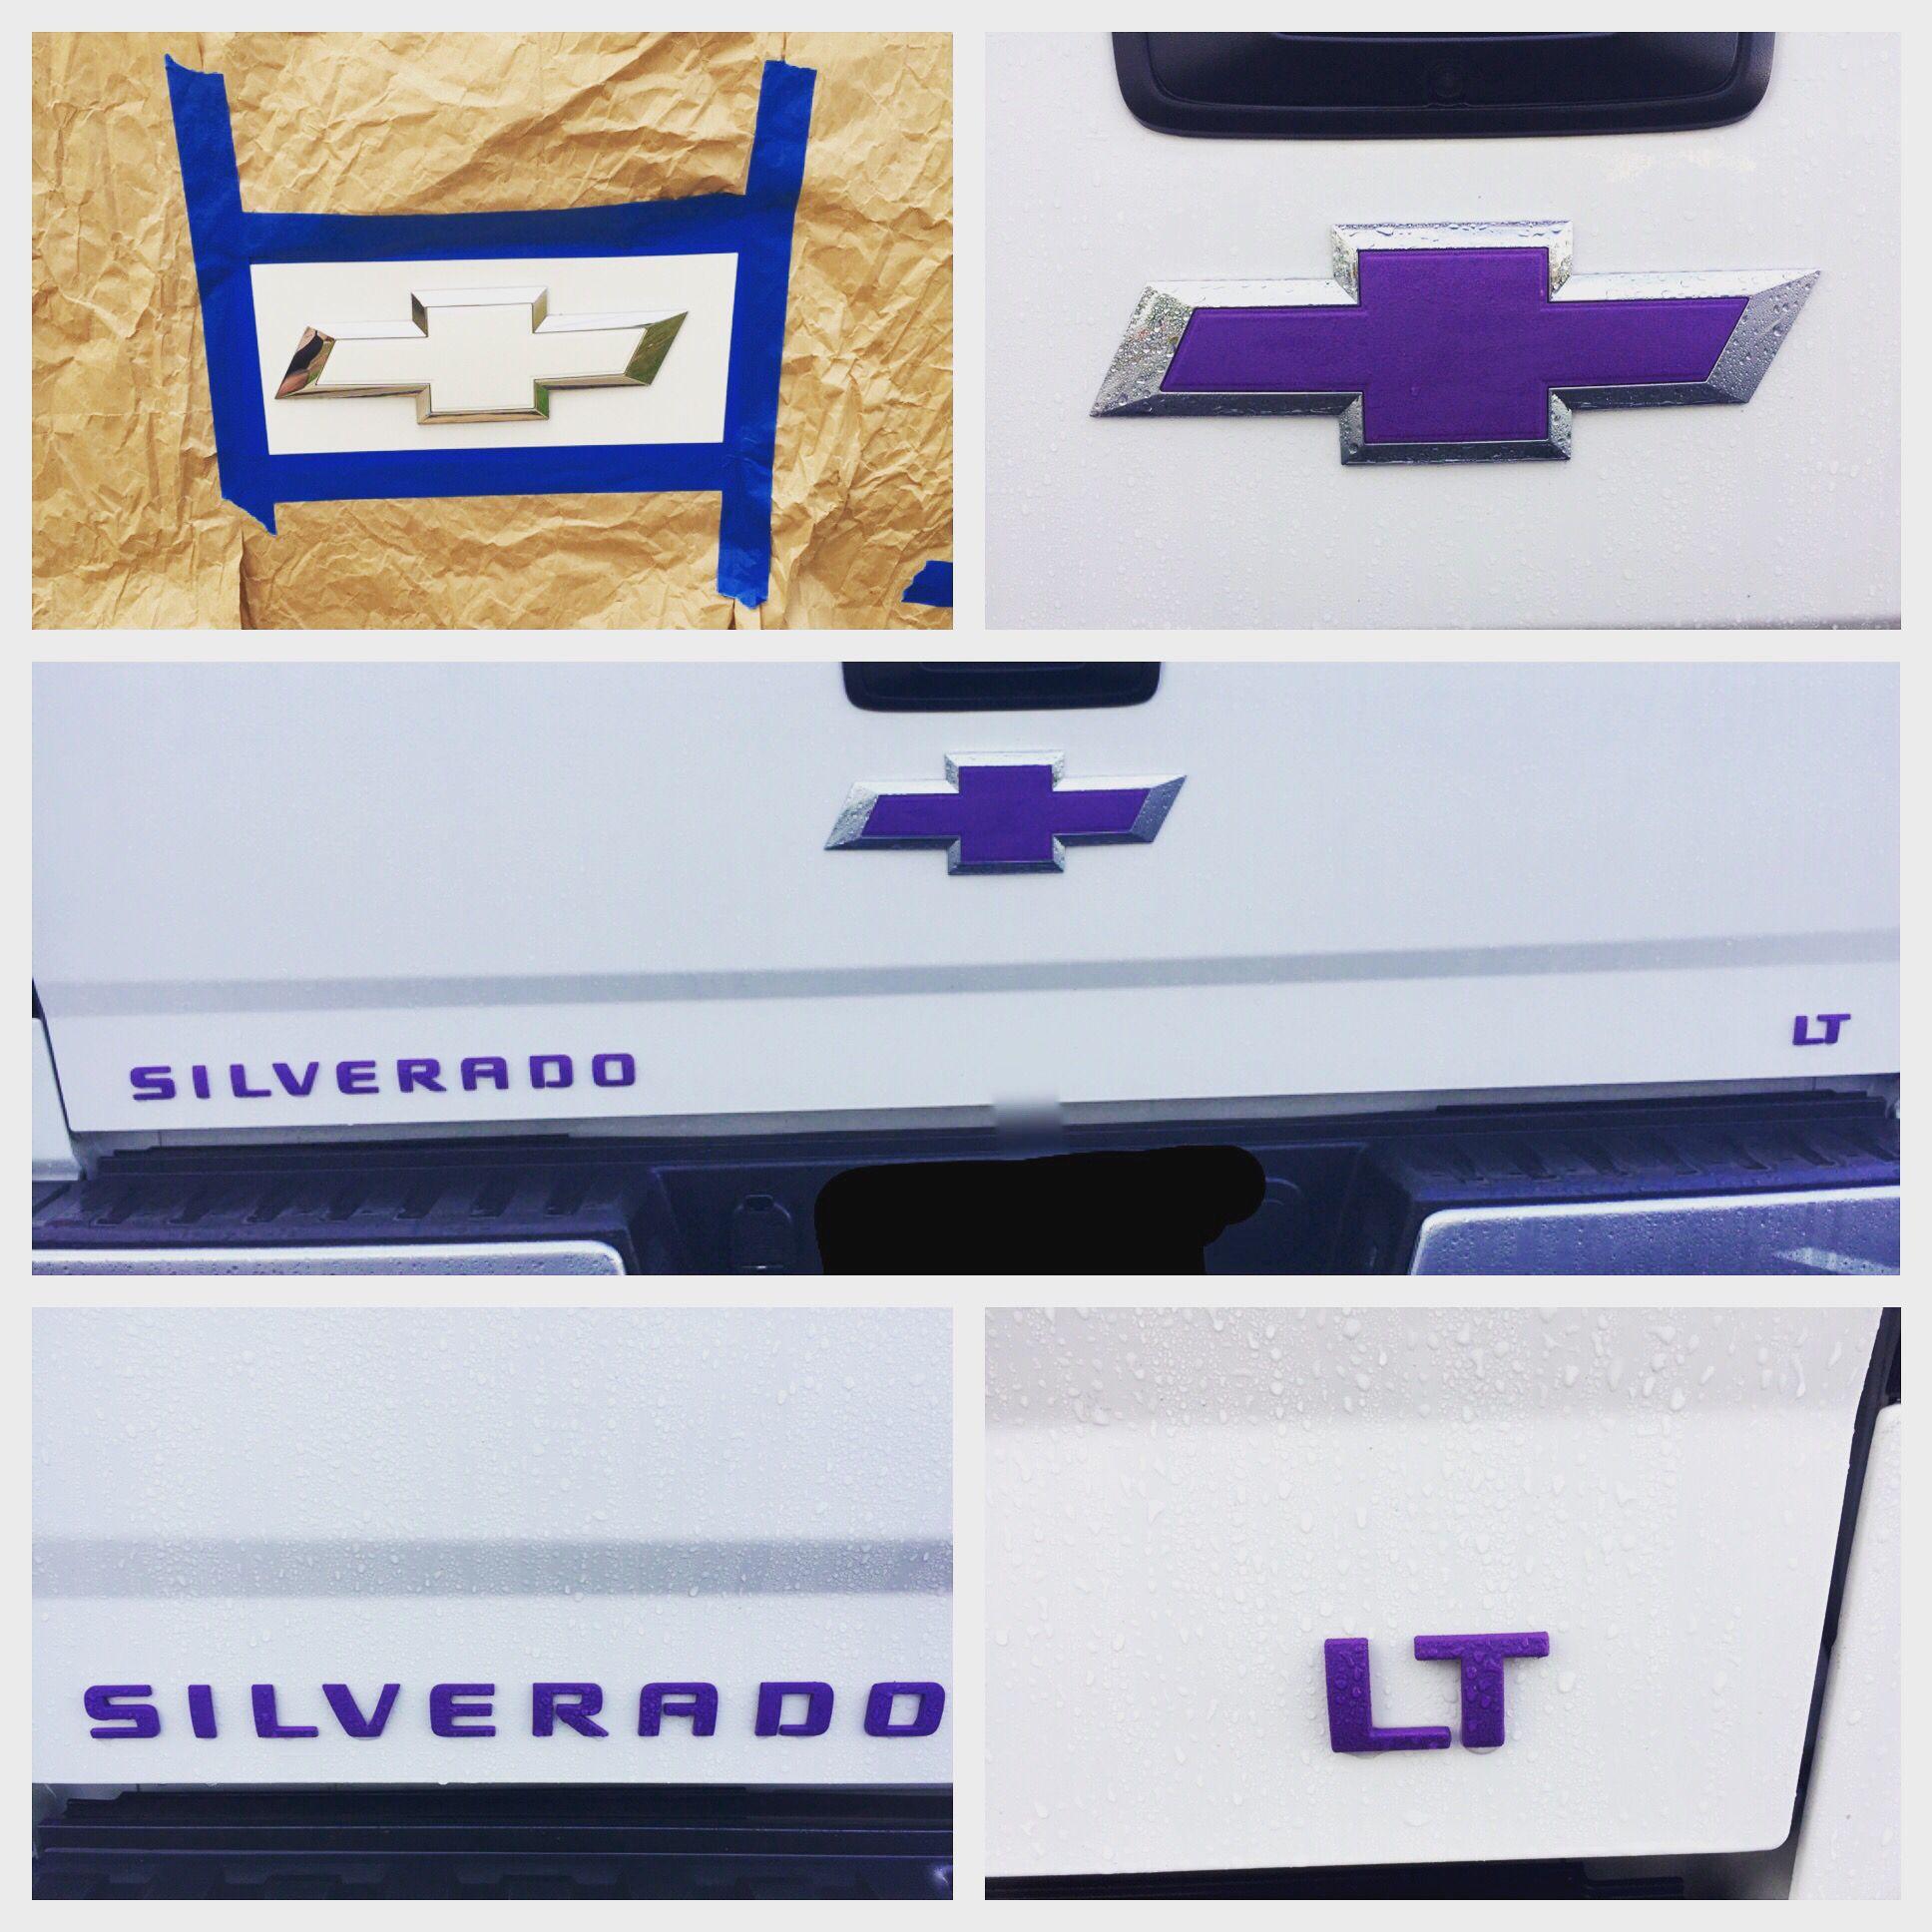 Purple Plasti Dip Emblems On My 2014 Rocky Ridge Silverado Chevy Silverado Plastidip Purple Bowtie Emb Chevy Silverado Accessories Chevy Jeep Interiors